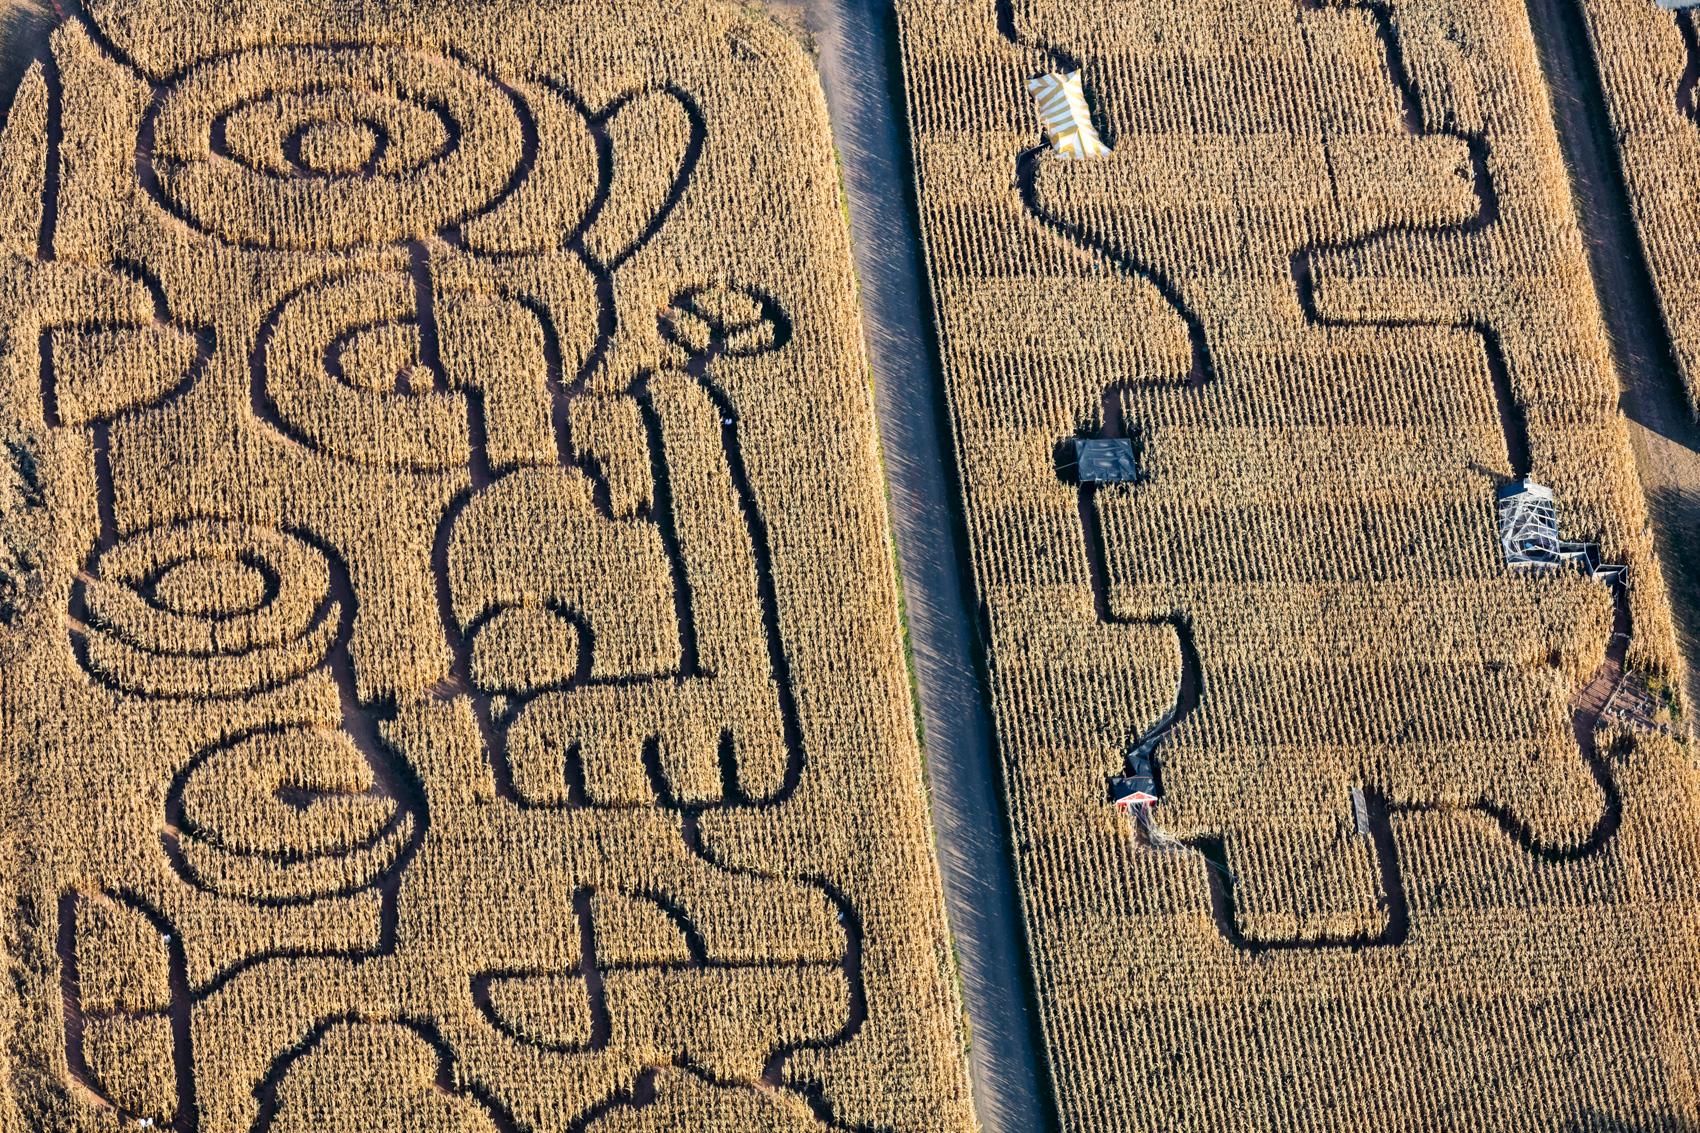 Tractor Maze, Somerset County, NJ 2016 (161019-0480)